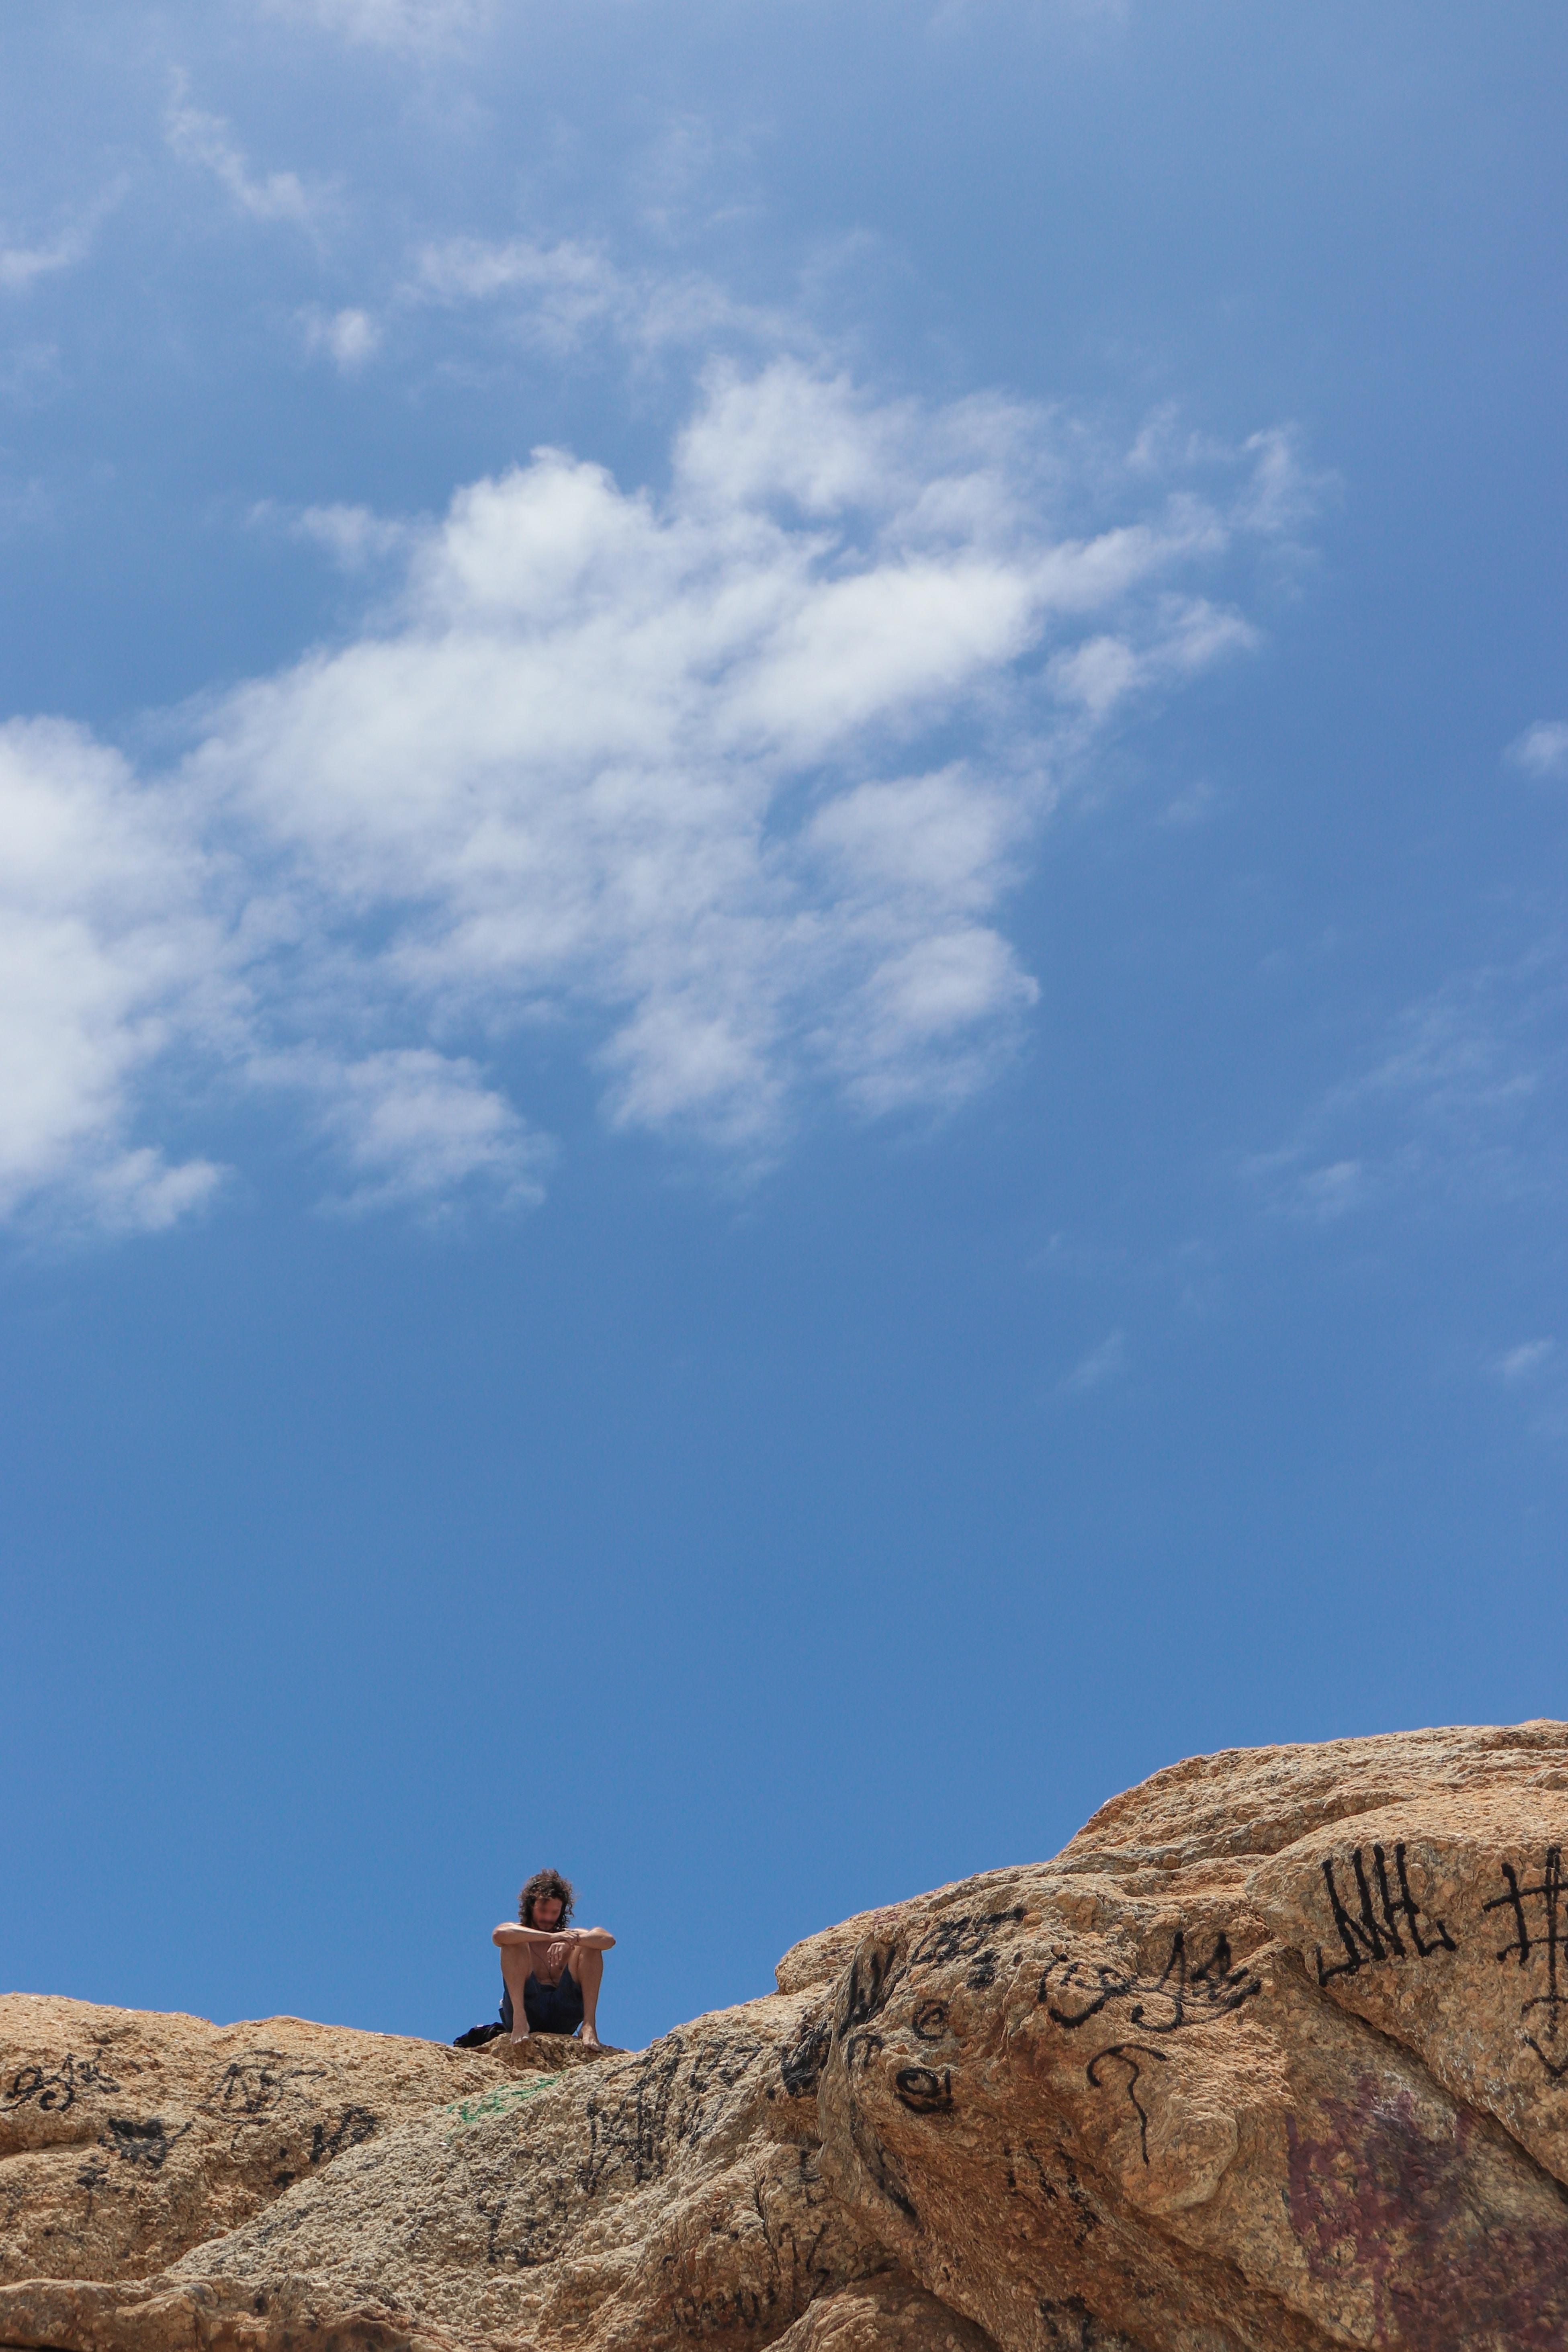 man sitting on rock formation under clear blue sky